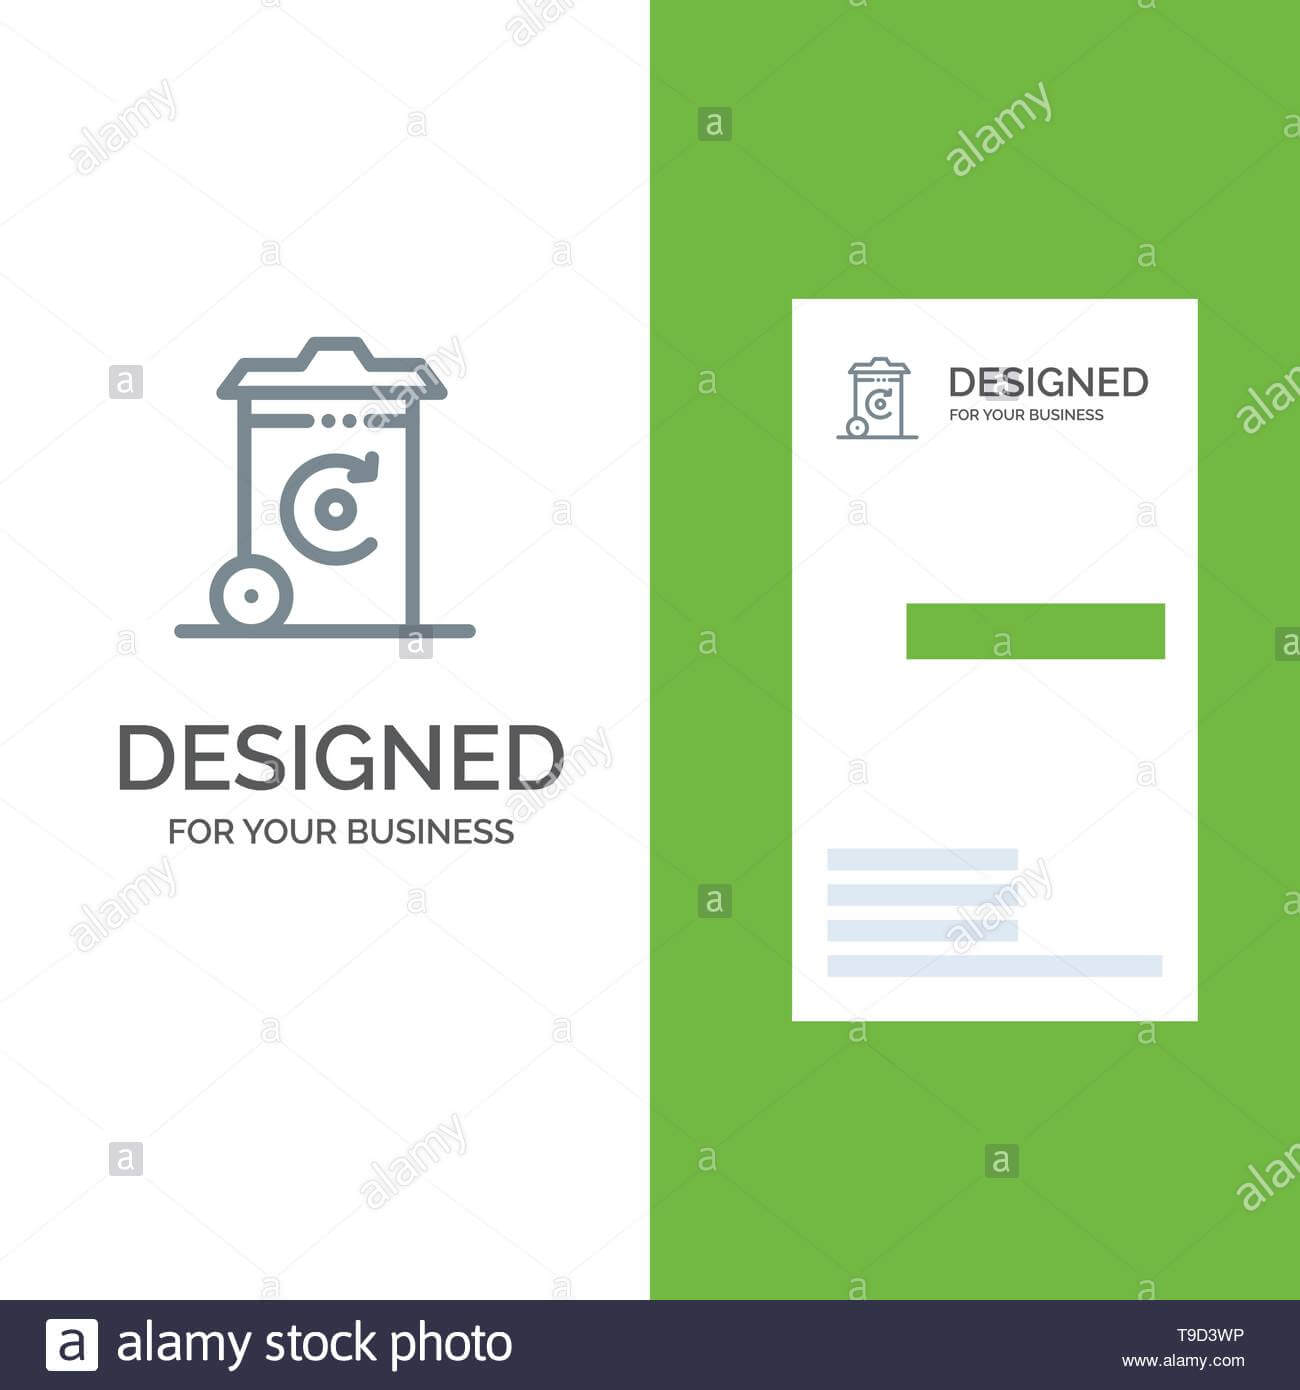 Bin, Recycling, Energy, Recycil Bin Grey Logo Design And Intended For Bin Card Template